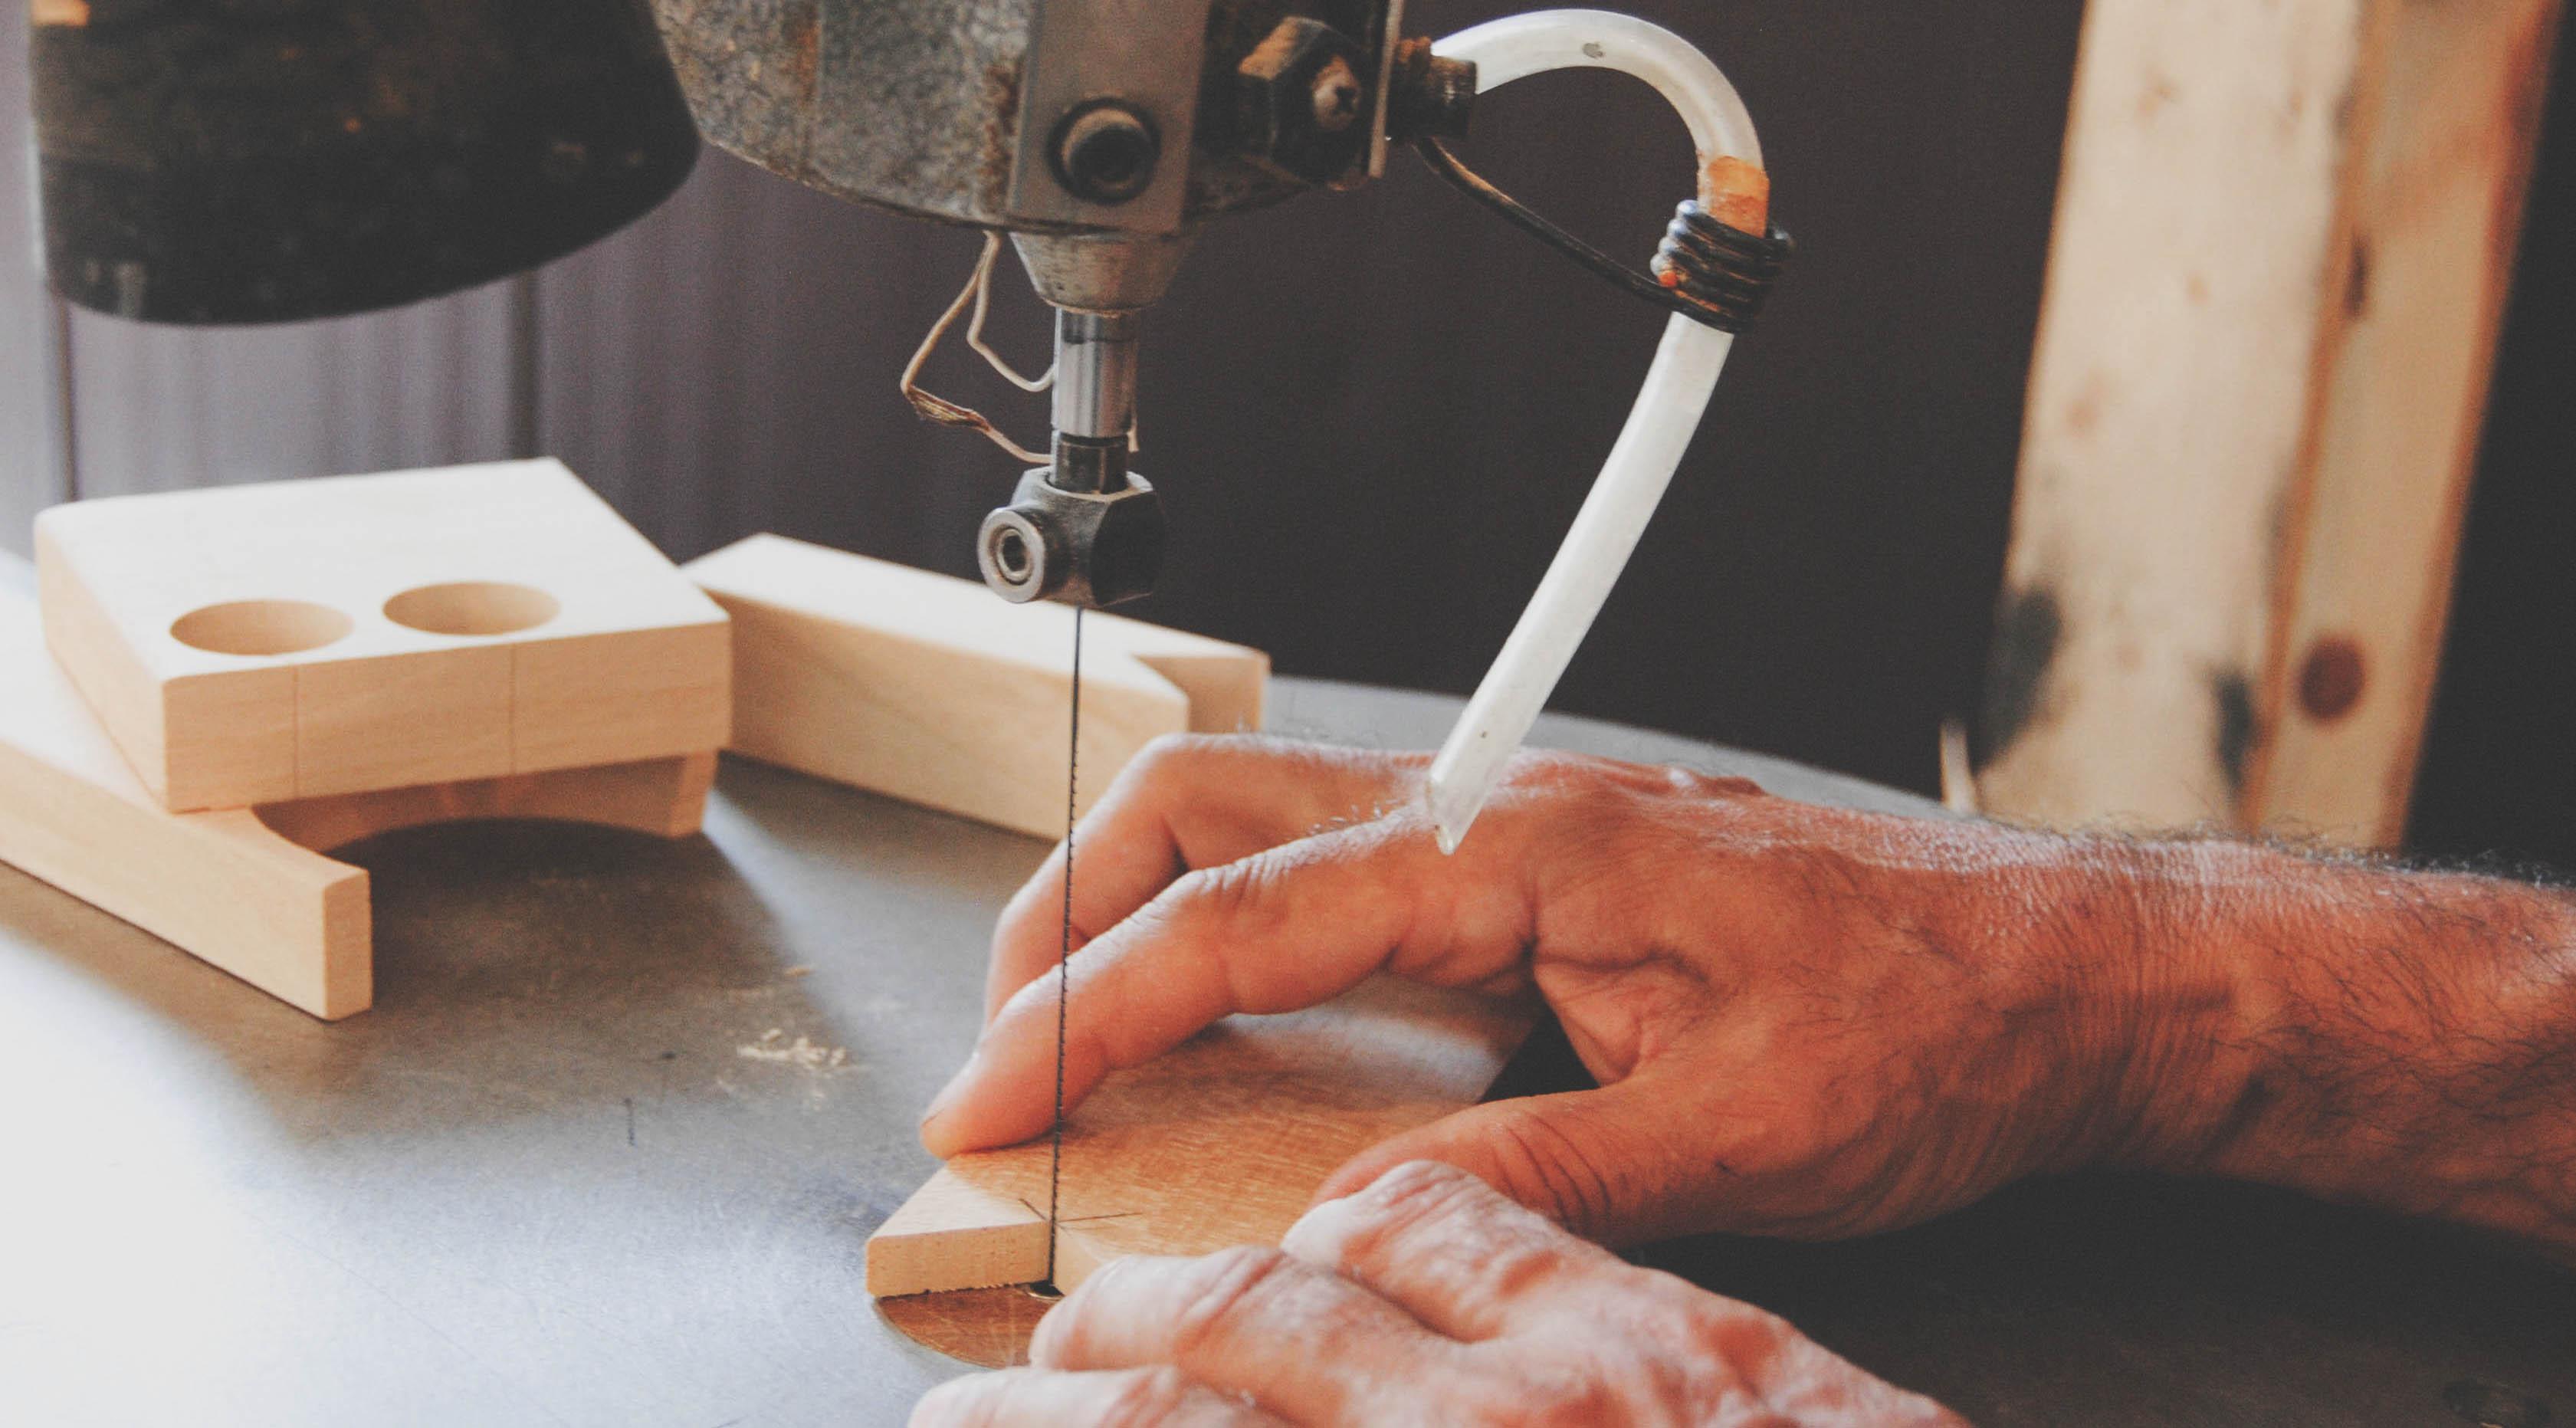 designobject company handworking